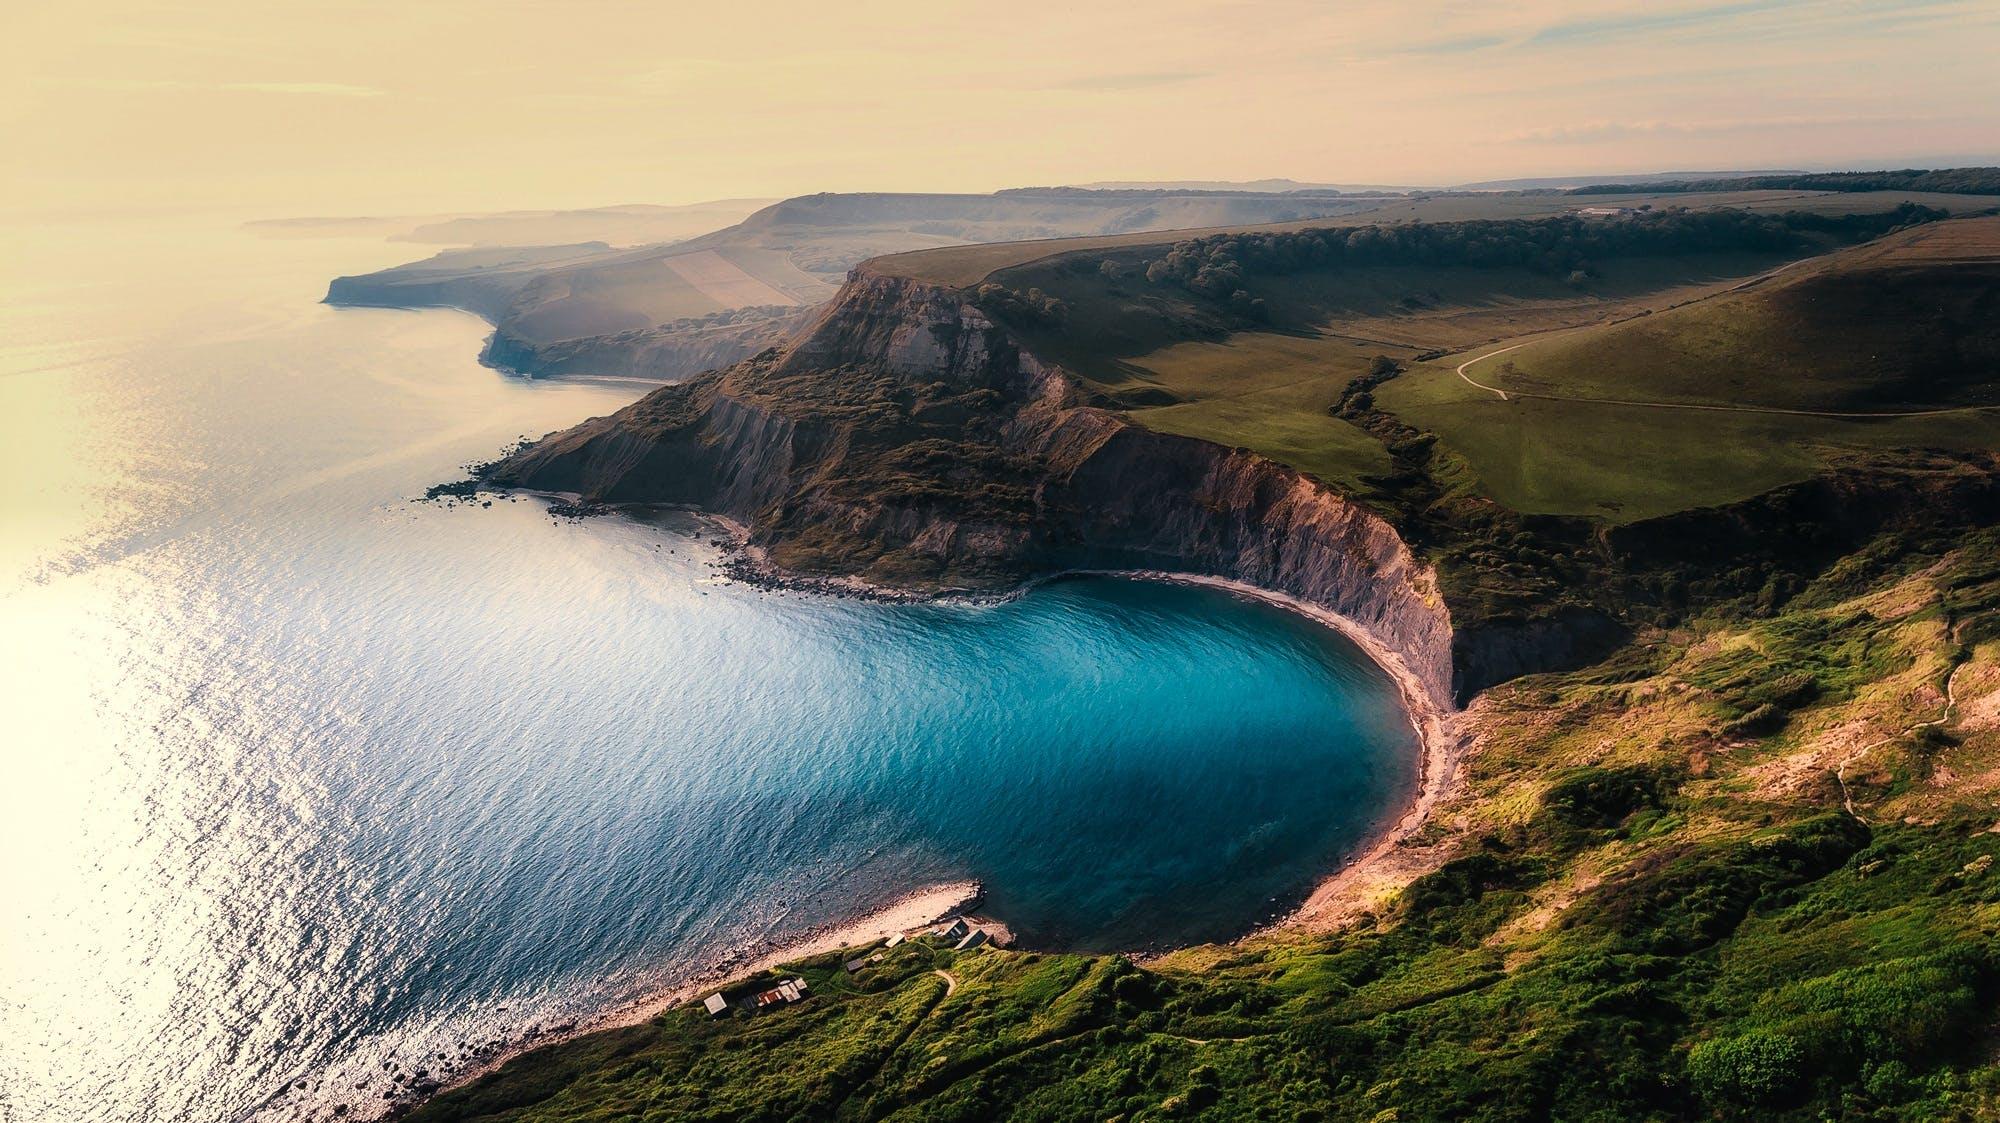 aerial view, beach, beautiful